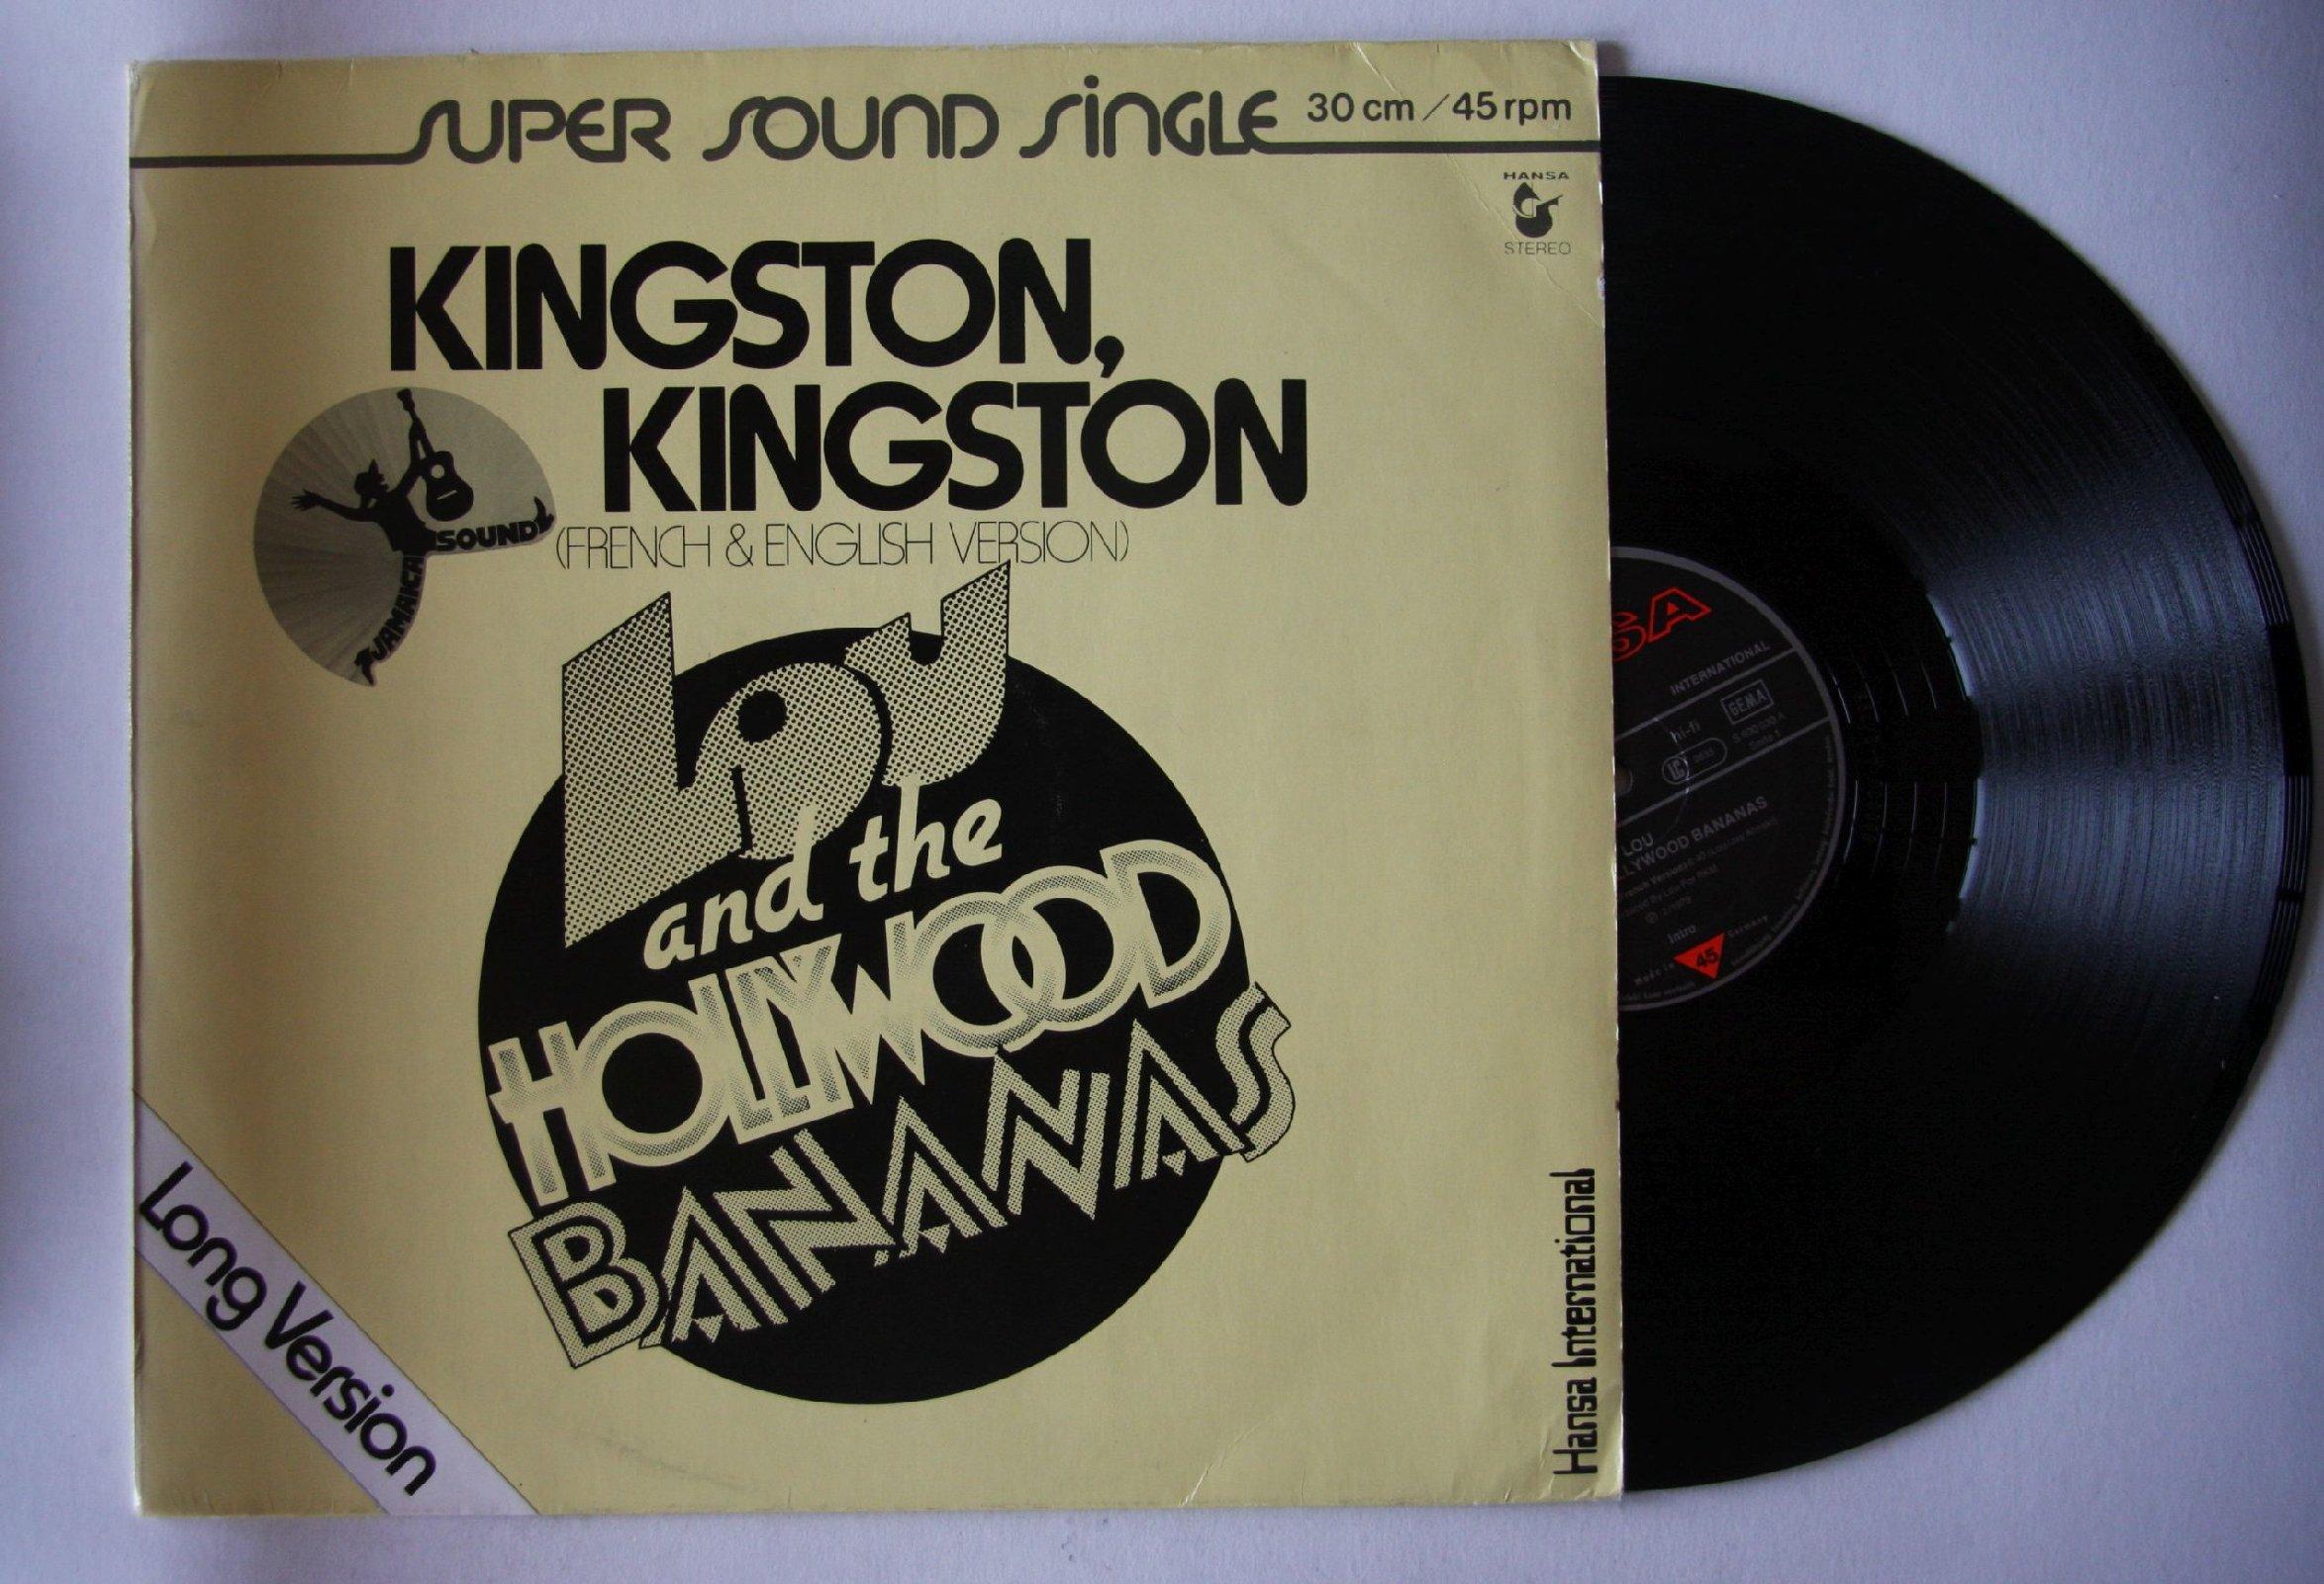 Lou The Hollywood Bananas Two Man Sound Kingston Kingston Que Tal America